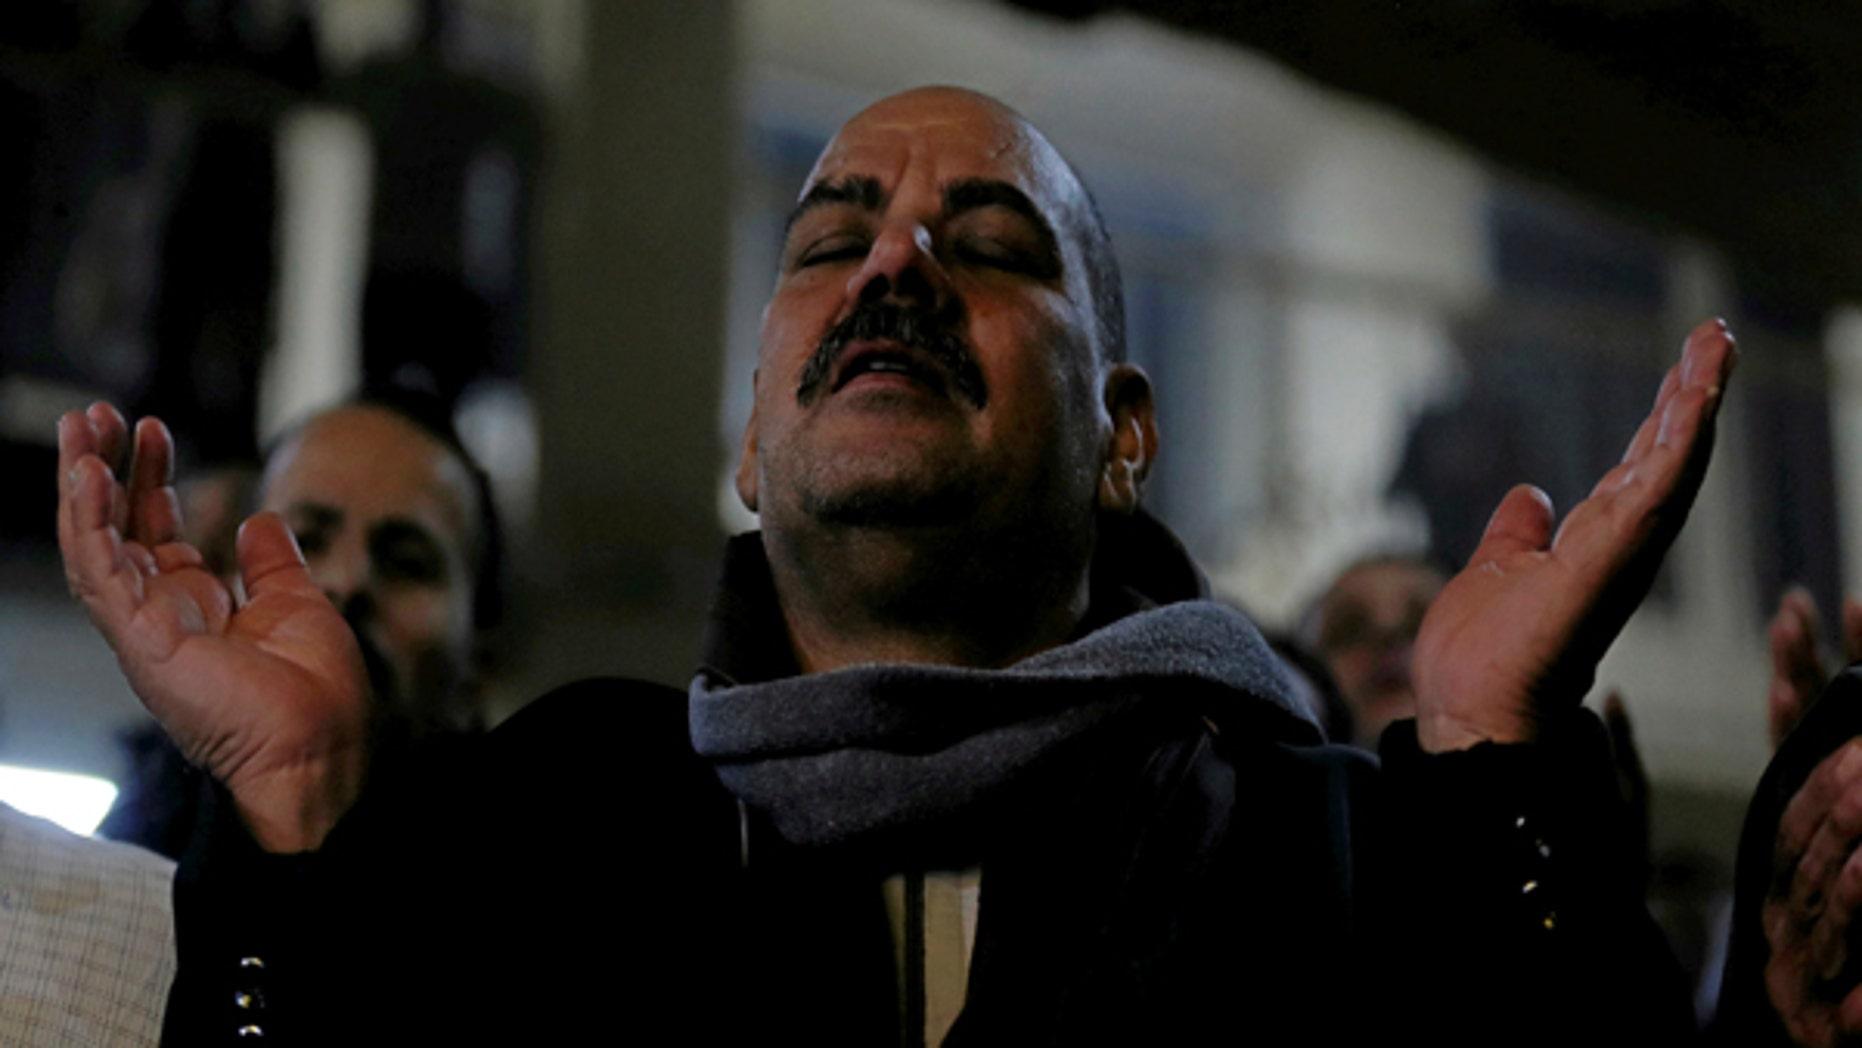 January 6, 2017: An Egyptian Christian attends Egypt's Coptic Christmas eve mass in a church of the Samaan el-Kharaz Monastery in the Mokattam Mountain area of Cairo, Egypt.